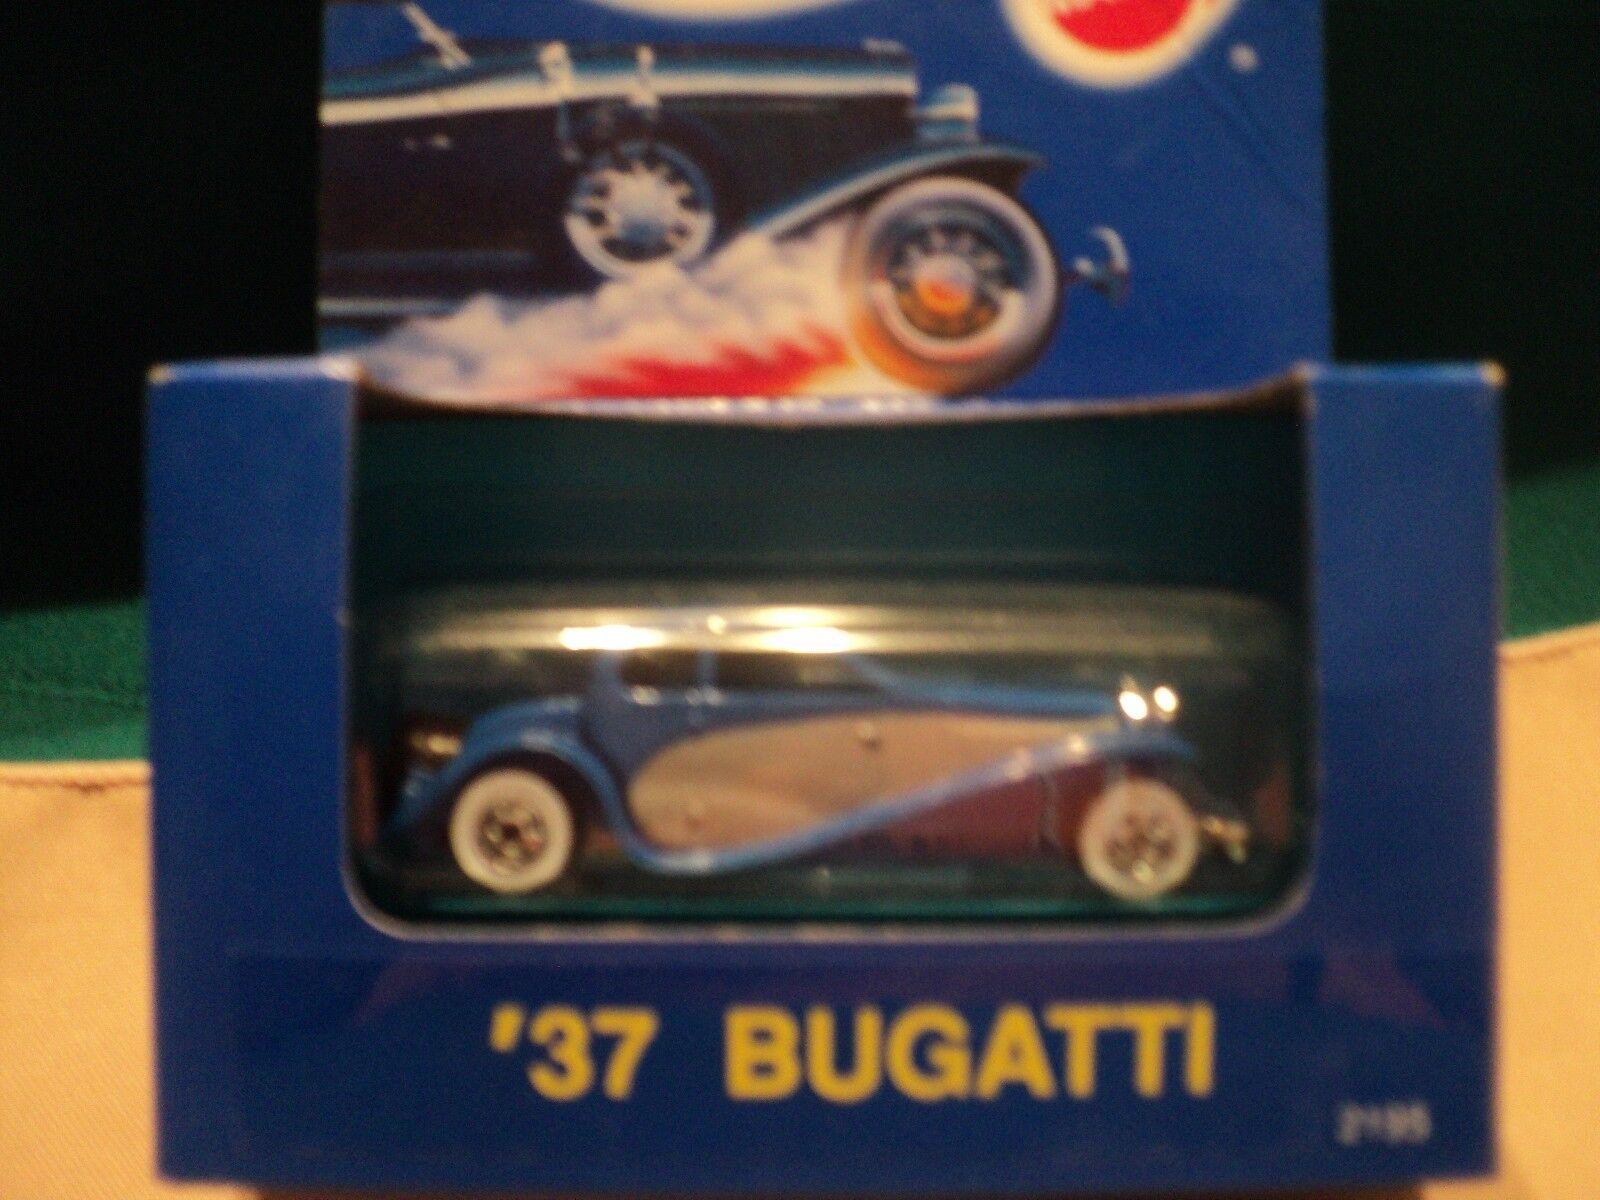 HOT WHEELS RARE VHTF blueE BOX '37 BUGATTI DIECAST 1990